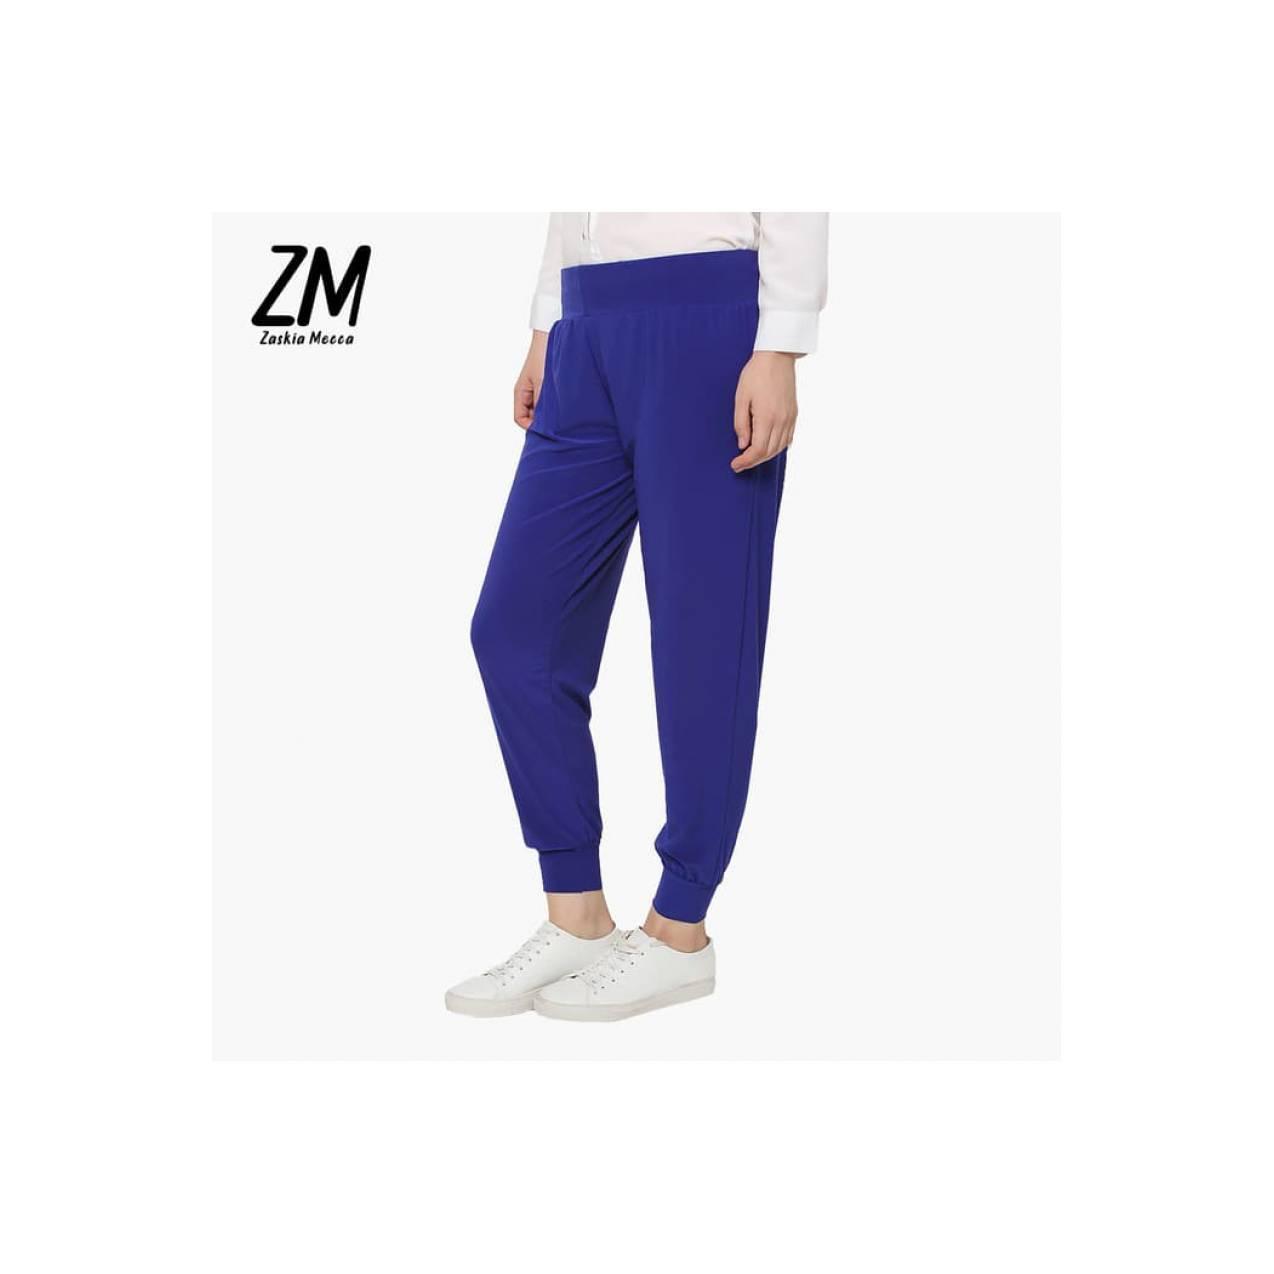 Celana Legging TERBARU Zaskia Mecca - Kenny Light Blue Pants